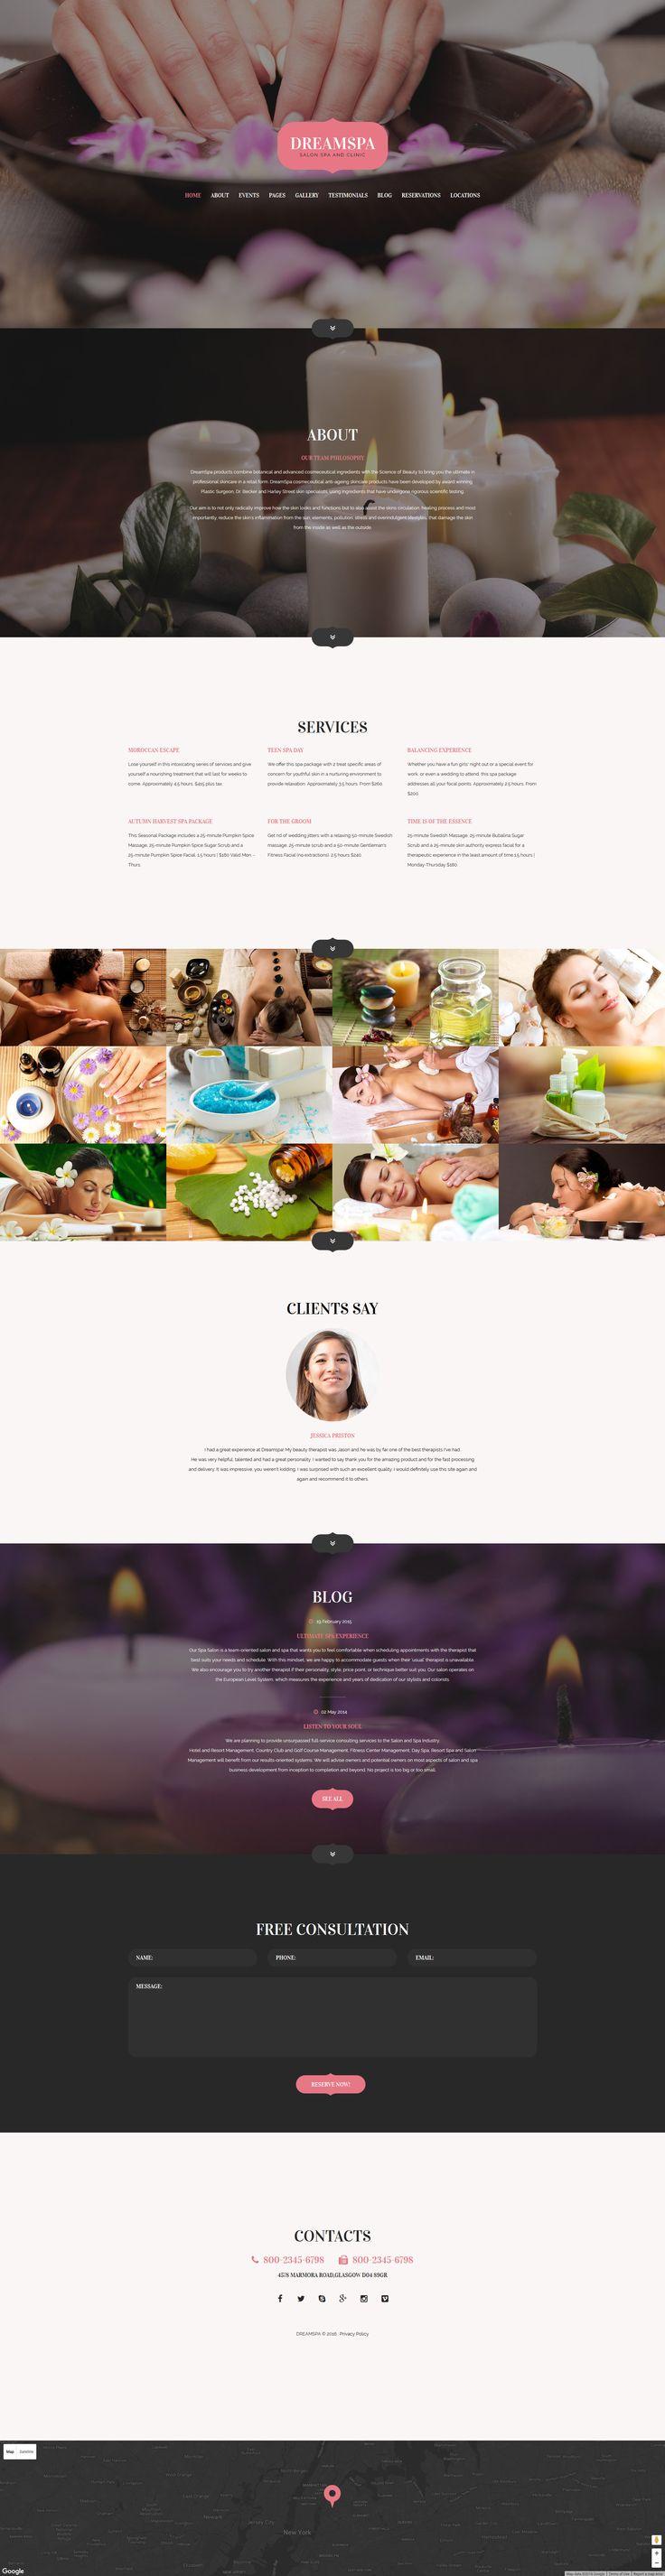 Beauty Parlour Joomla Template 102 best Website